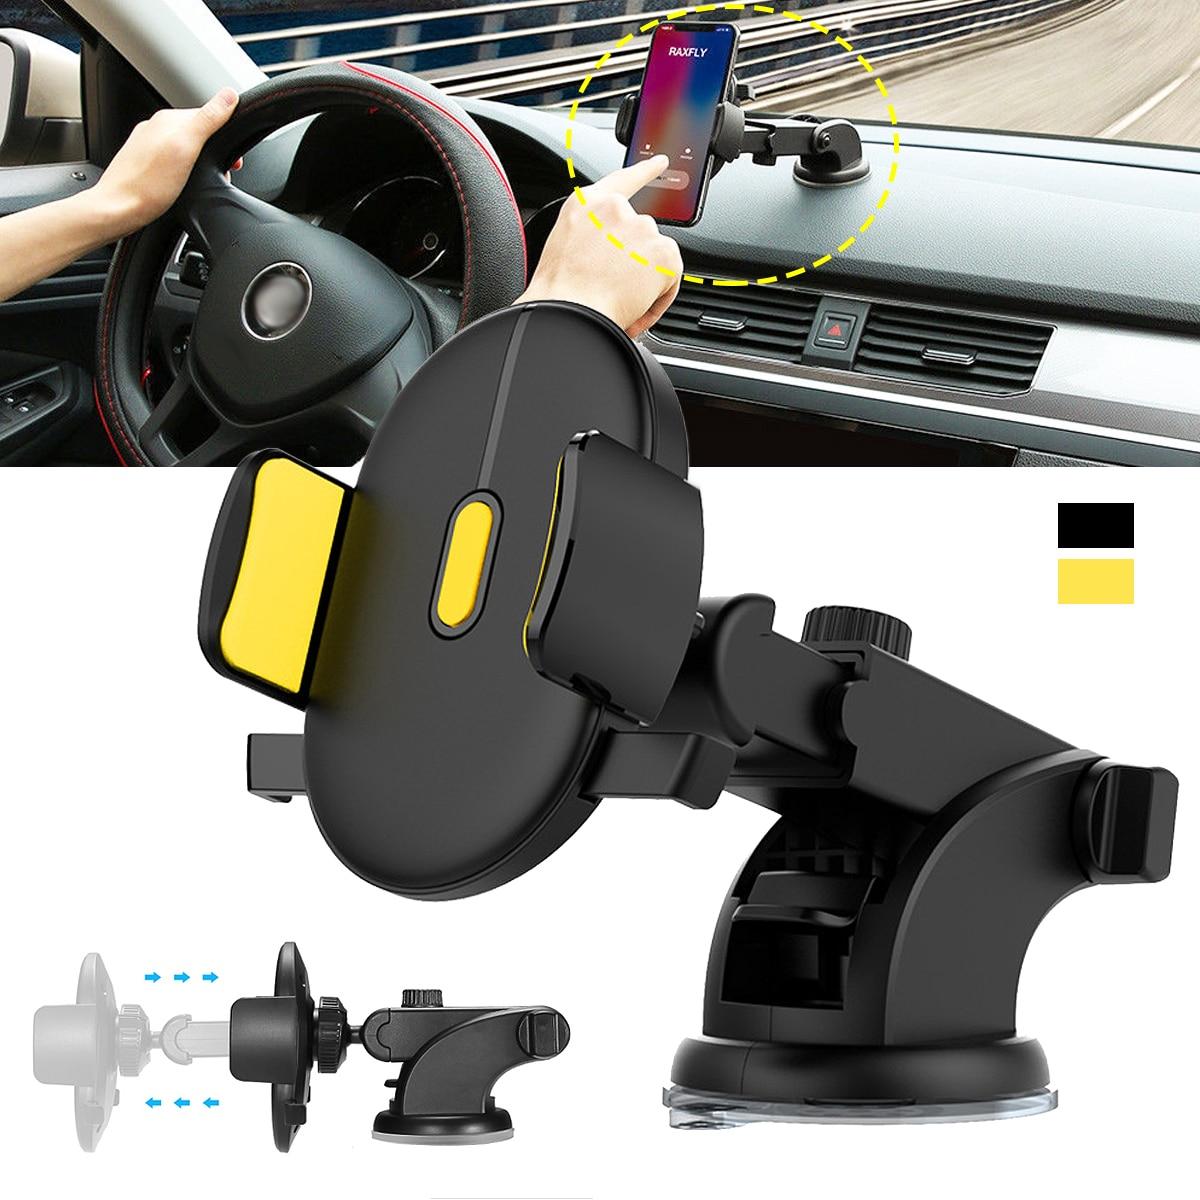 Adjustable Automatically Locking Phone Holder Mount Windshield Co-pilot Universal Car Phone Bracket Auto Interior Accessories